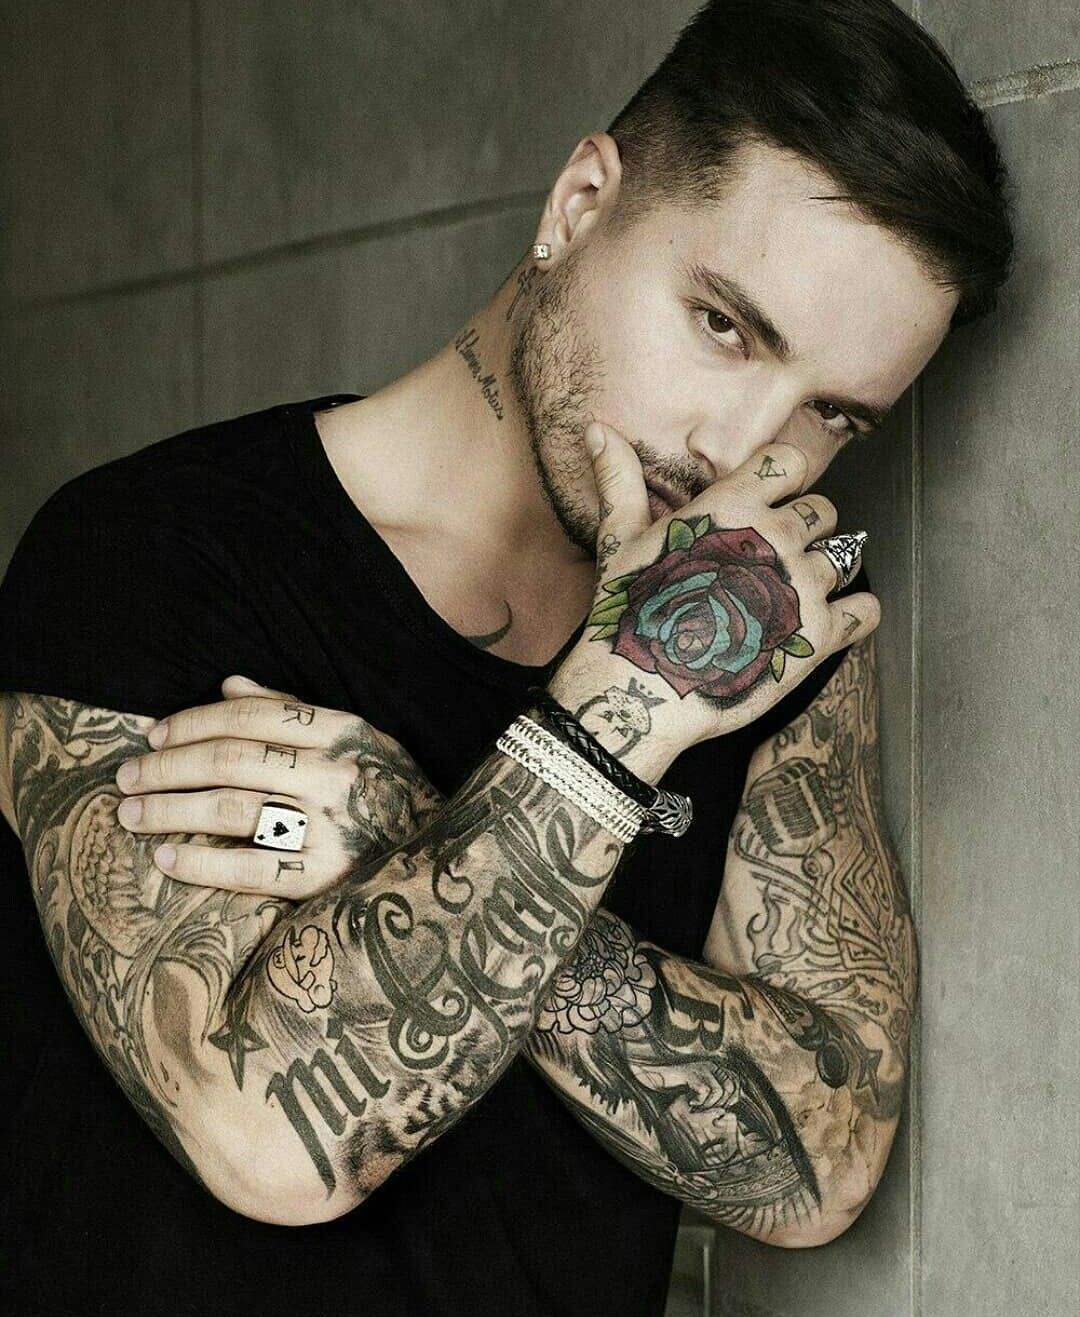 J balvin in 2020 Tattoos for guys, Tattoos, Guys